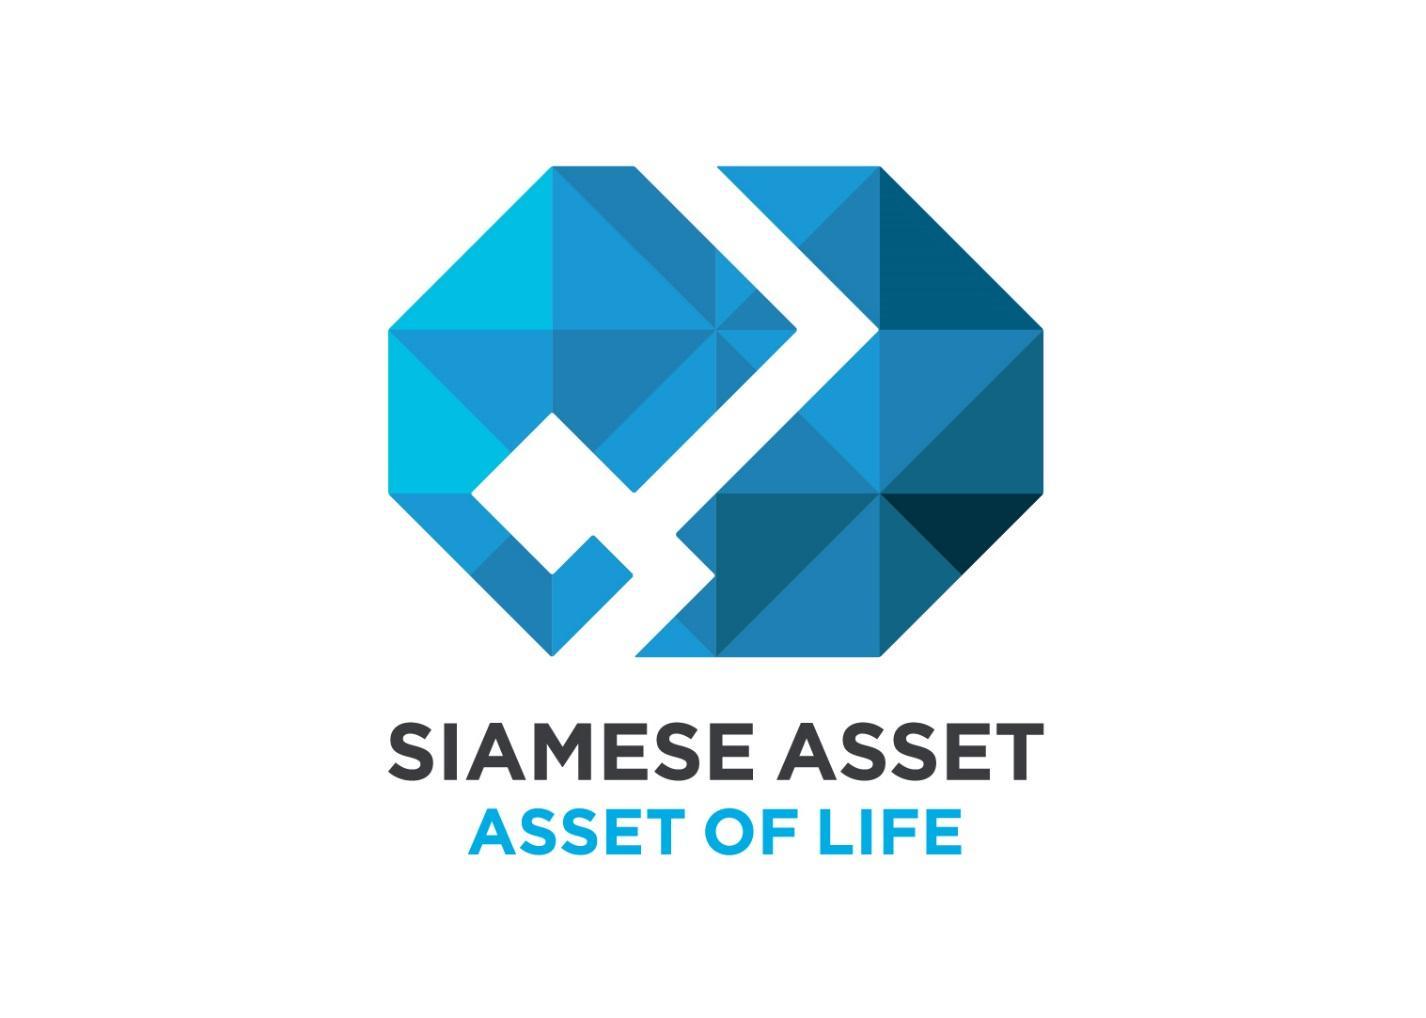 Siamese Asset logo